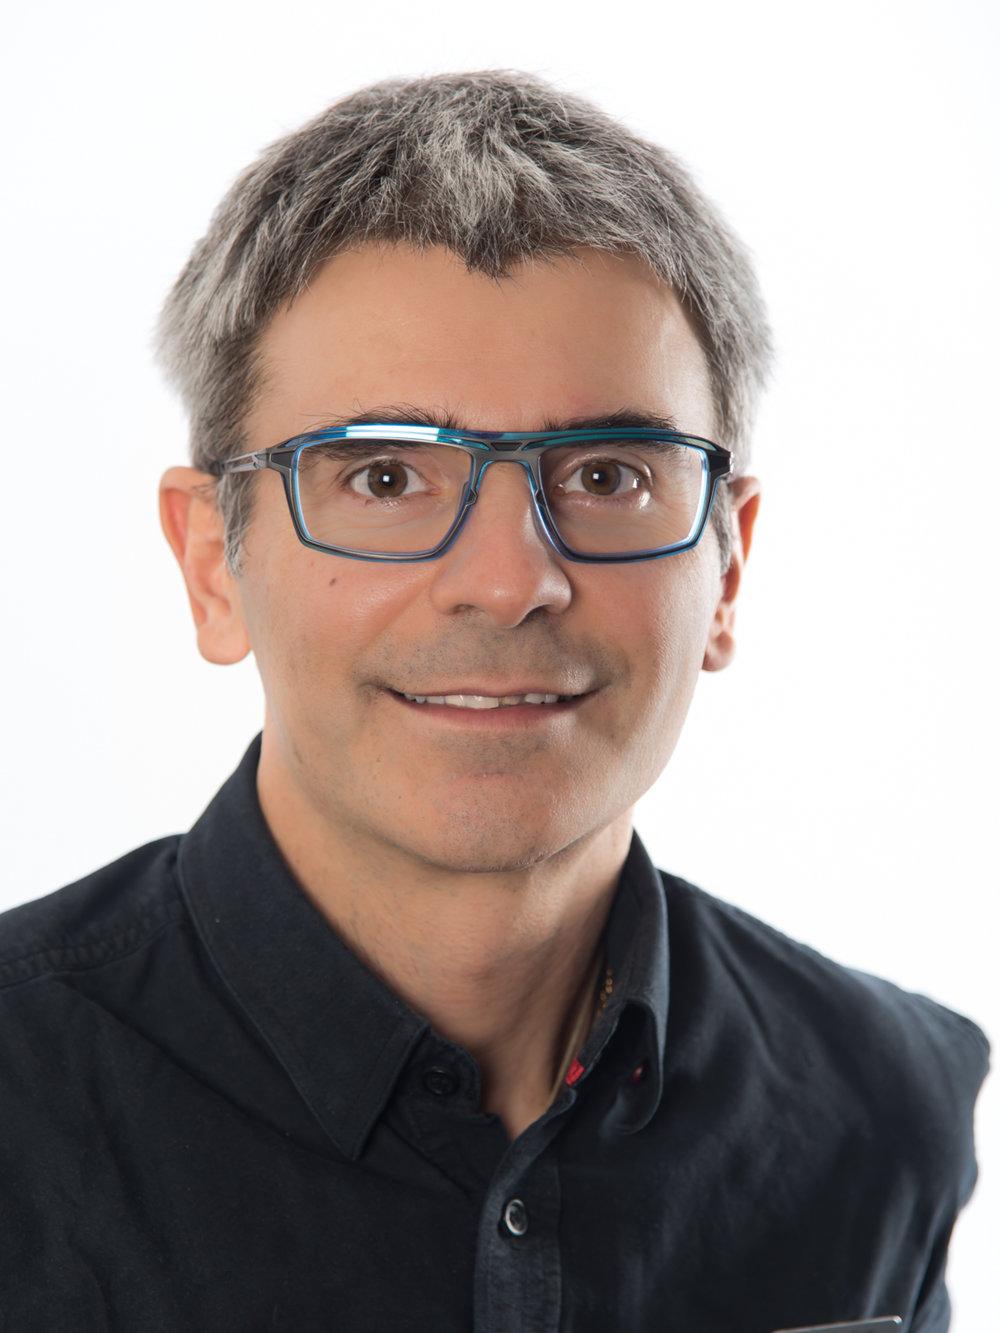 Kurt Grossrieder - Gérant / Opticien diplômé